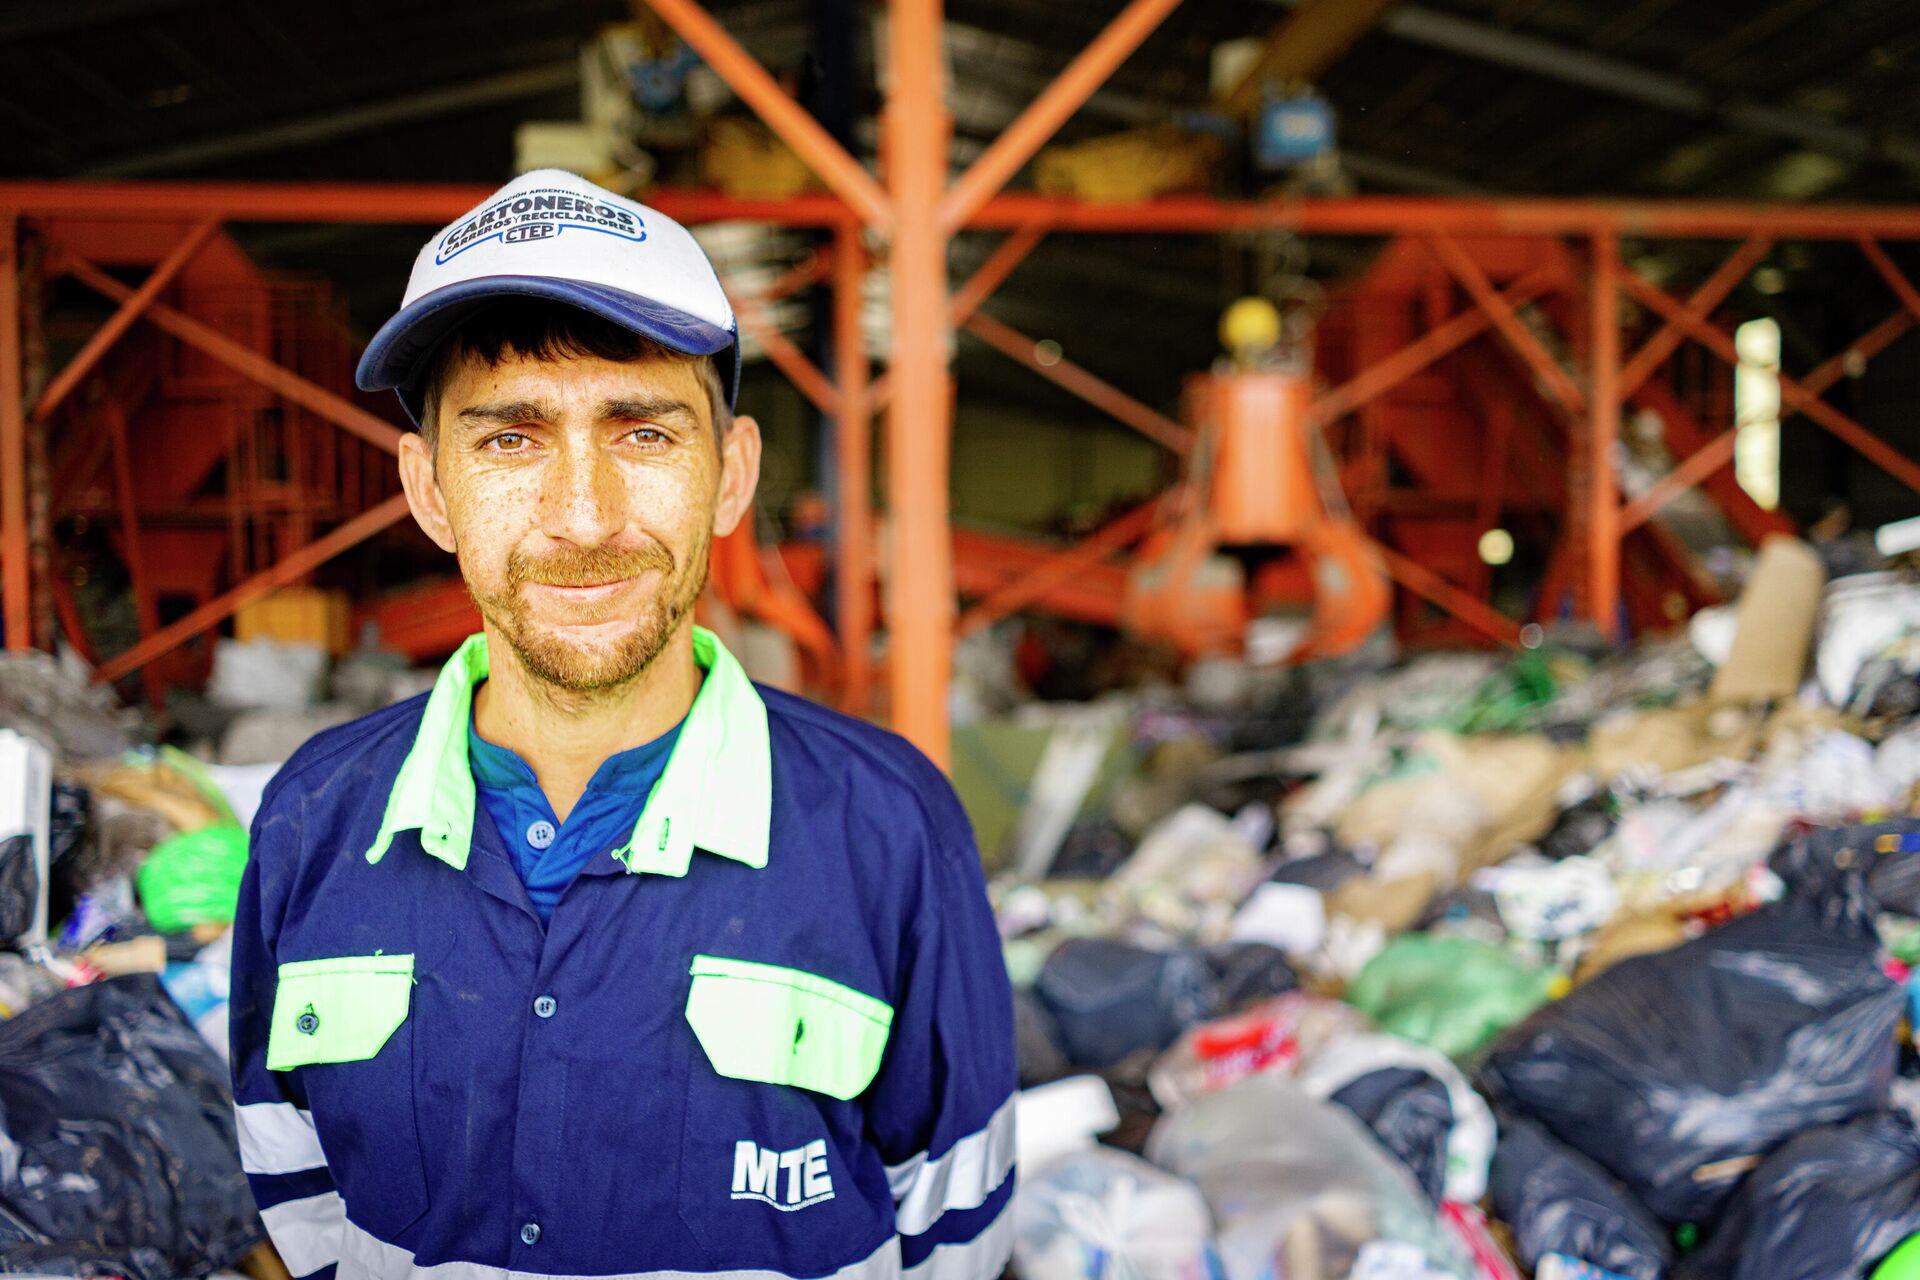 Jonathan Castillo, presidente de la cooperativa Recicladores Unidos de Avellaneda - Sputnik Mundo, 1920, 14.07.2021